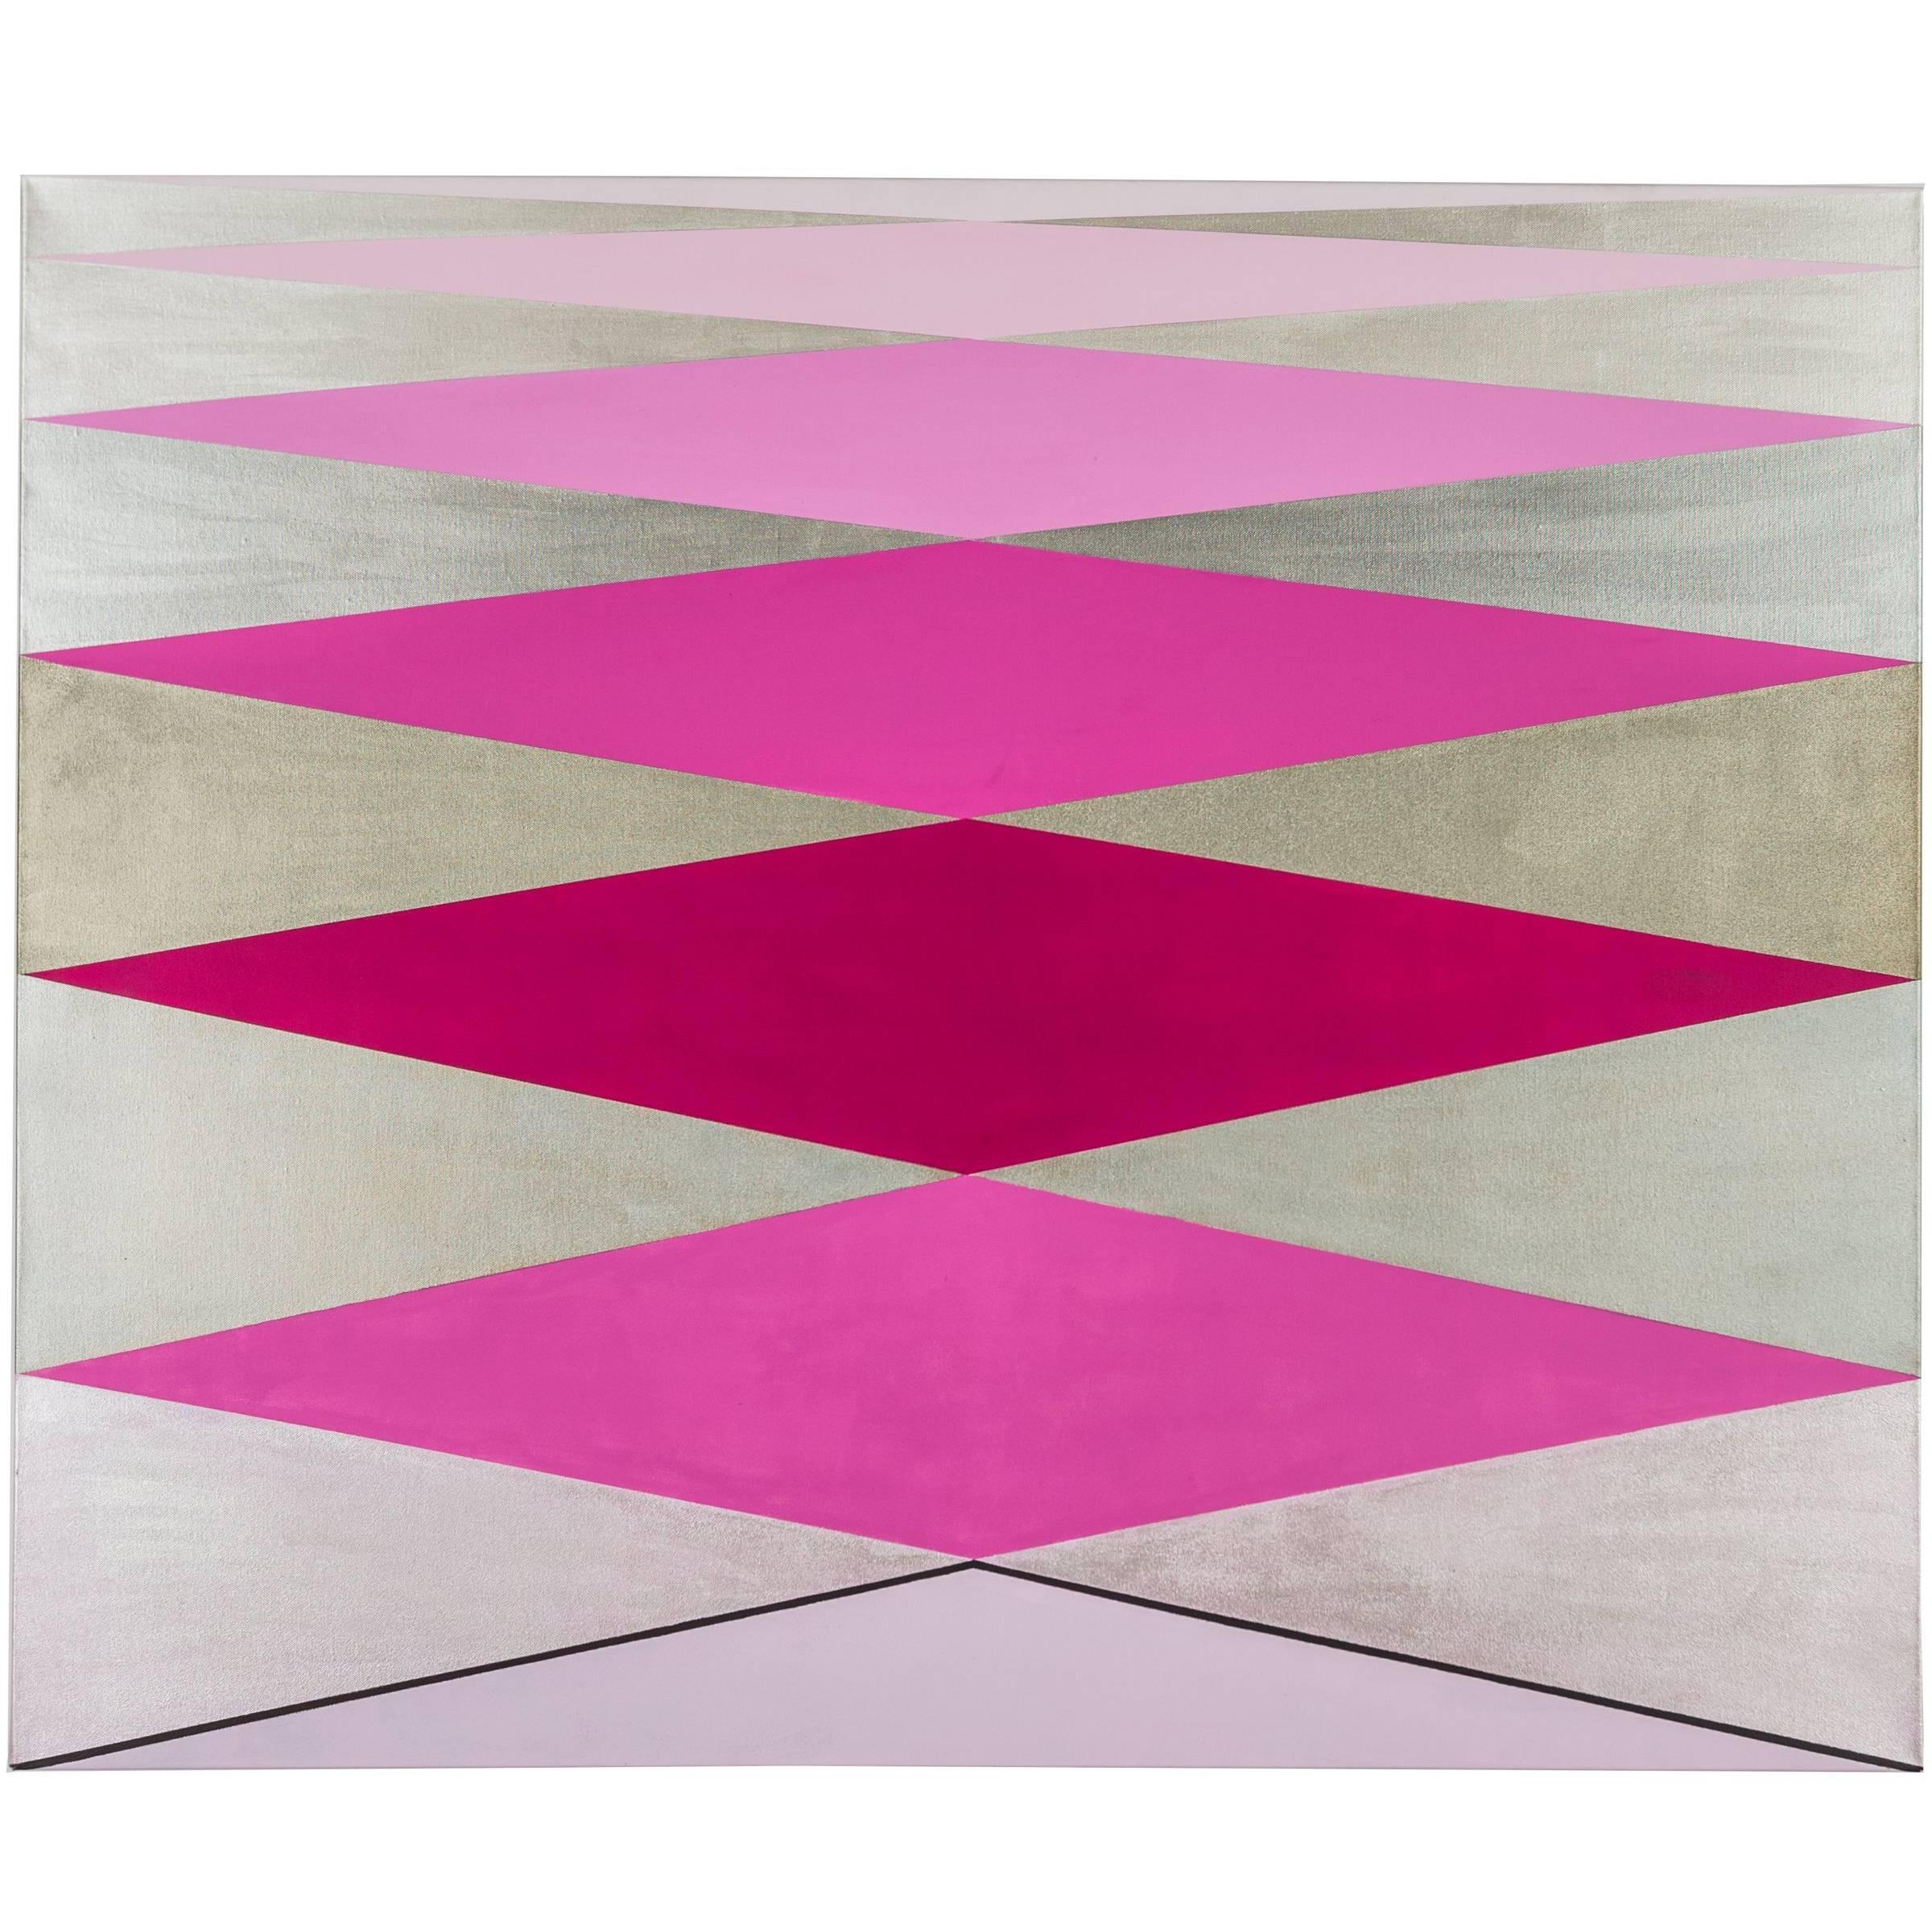 """Love"" 2012 Acrylic/Rose/ Geometric Modern on Canvas by Cecilia Setterdahl"